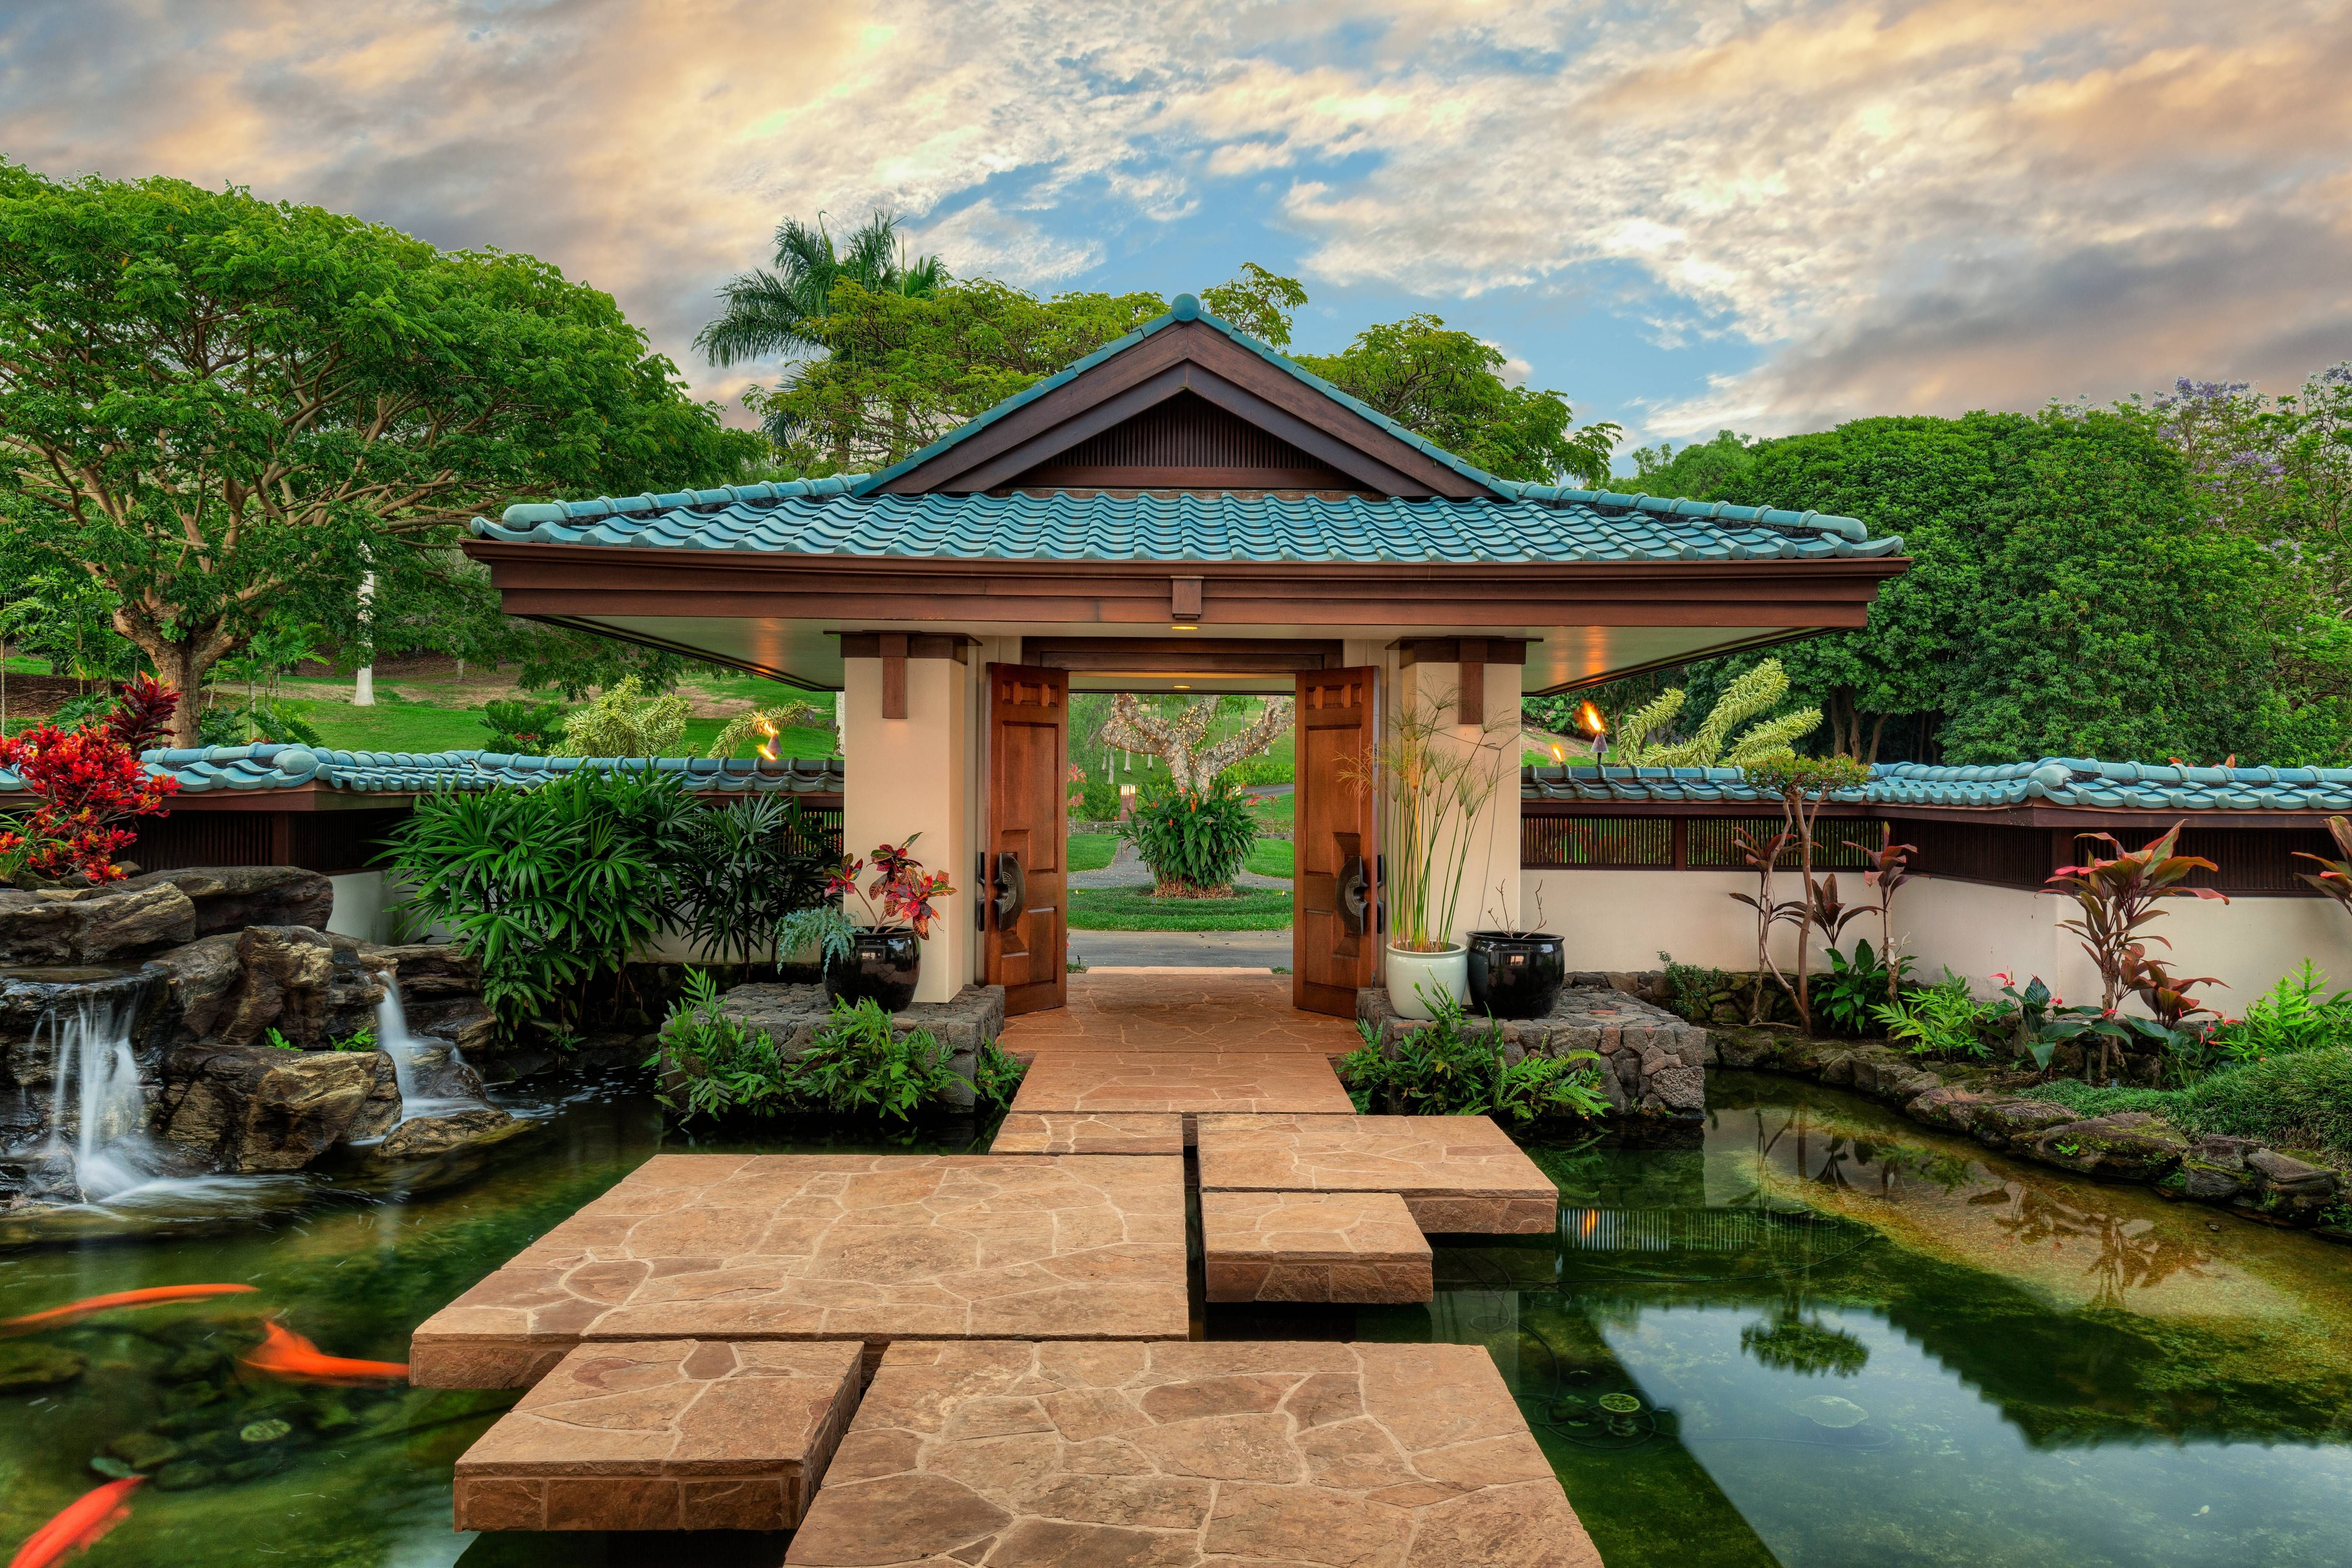 Hawaii Koi Ponds Backyard Pond Design Backyard